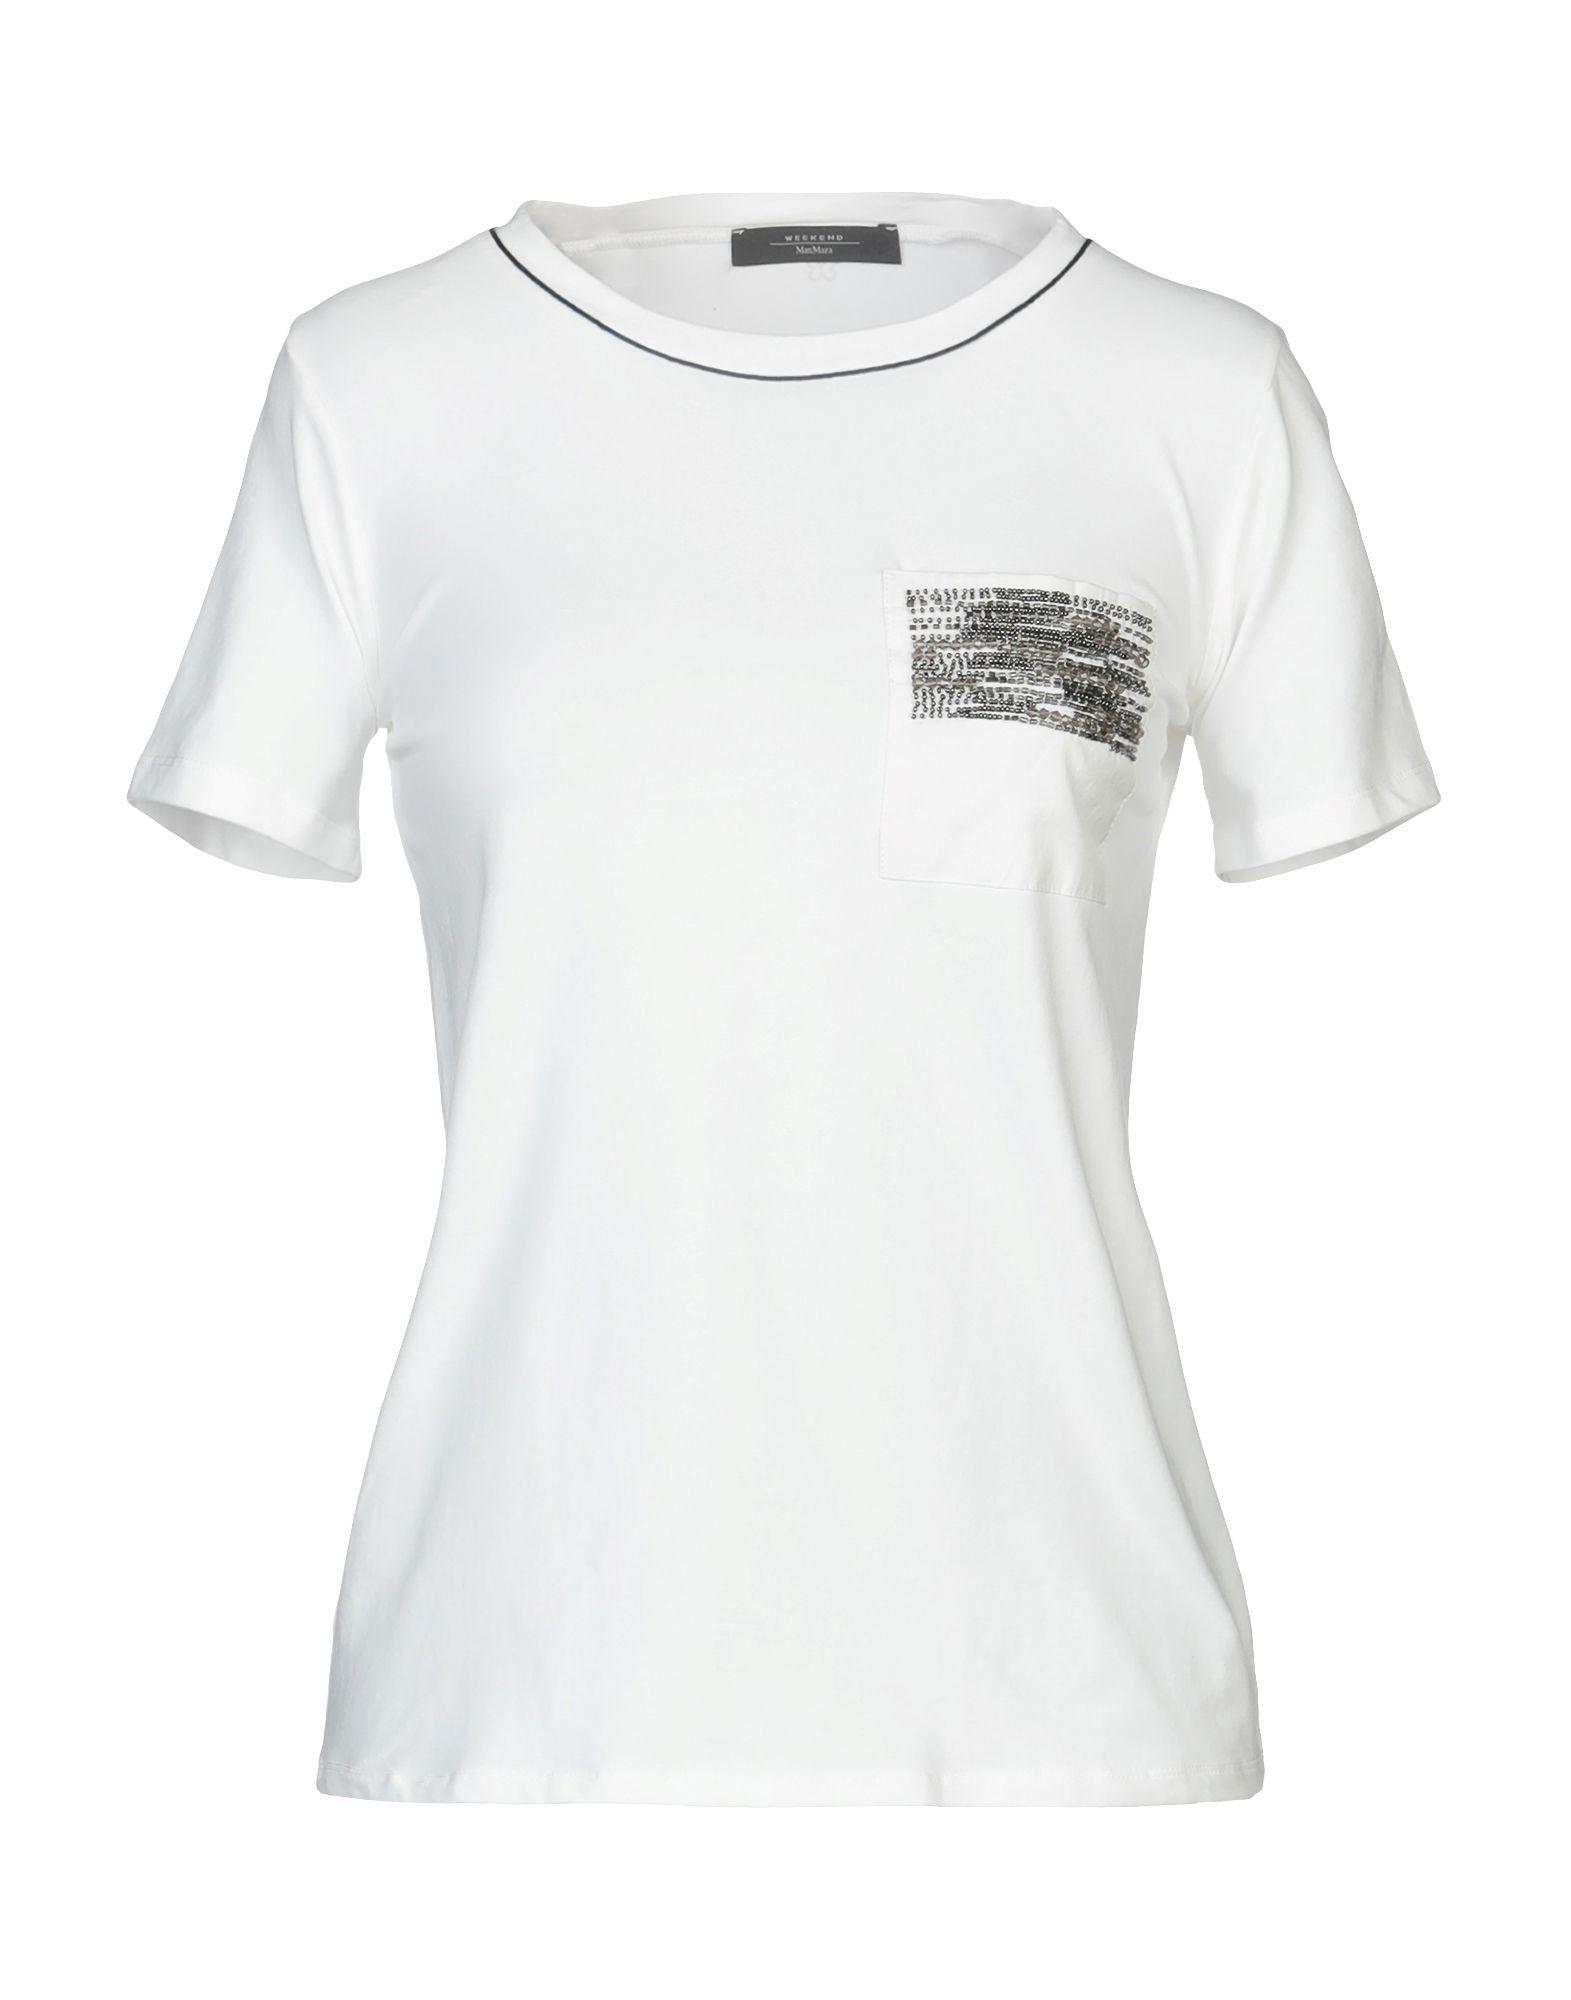 By In Weekend White Lyst T Maxmara Shirt 08nvmNw